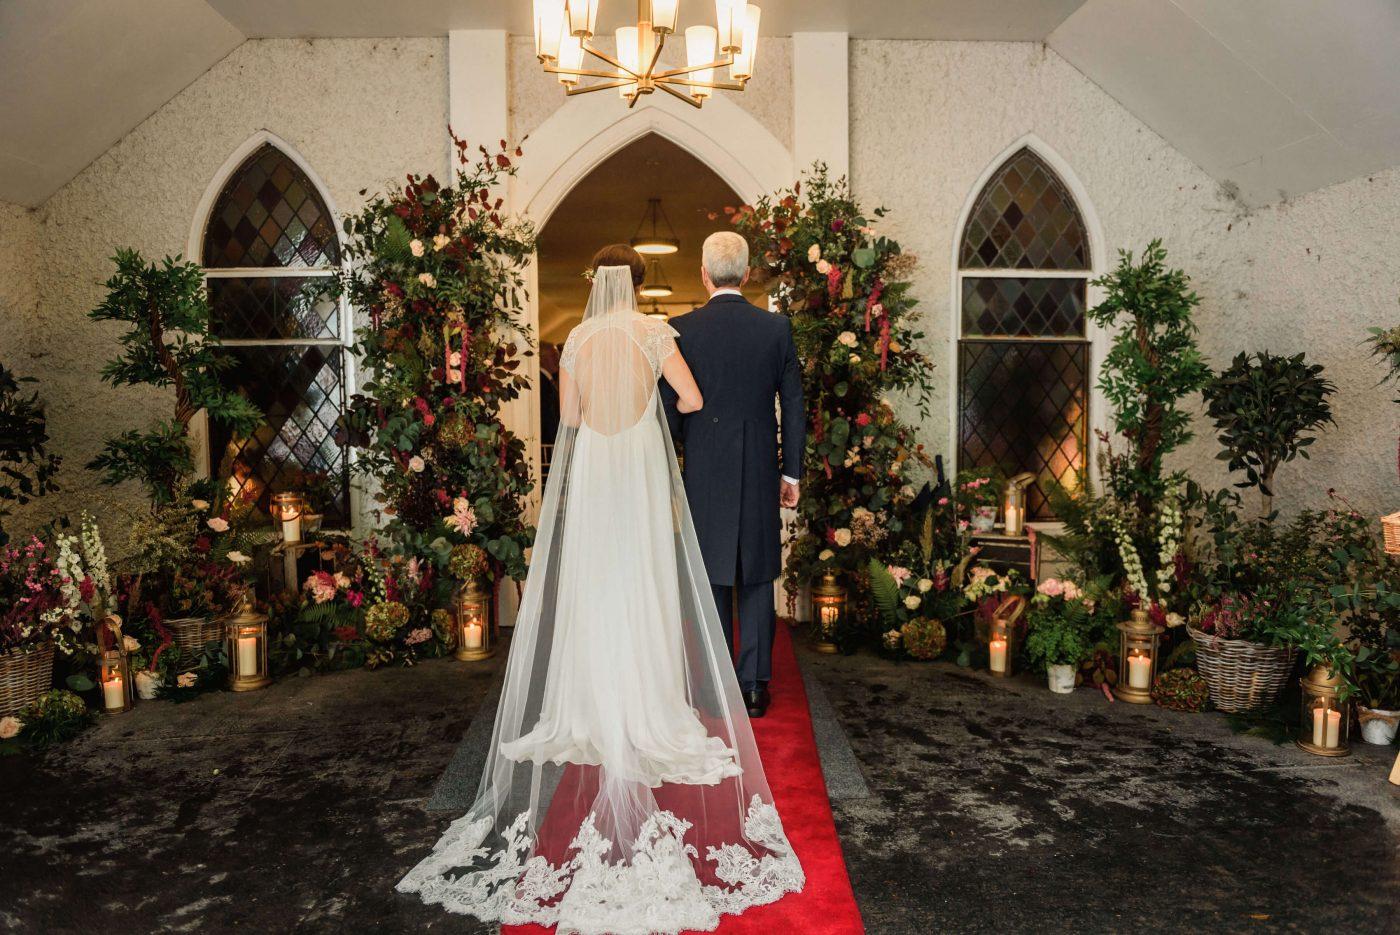 Rathsallagh House Wedding Venue